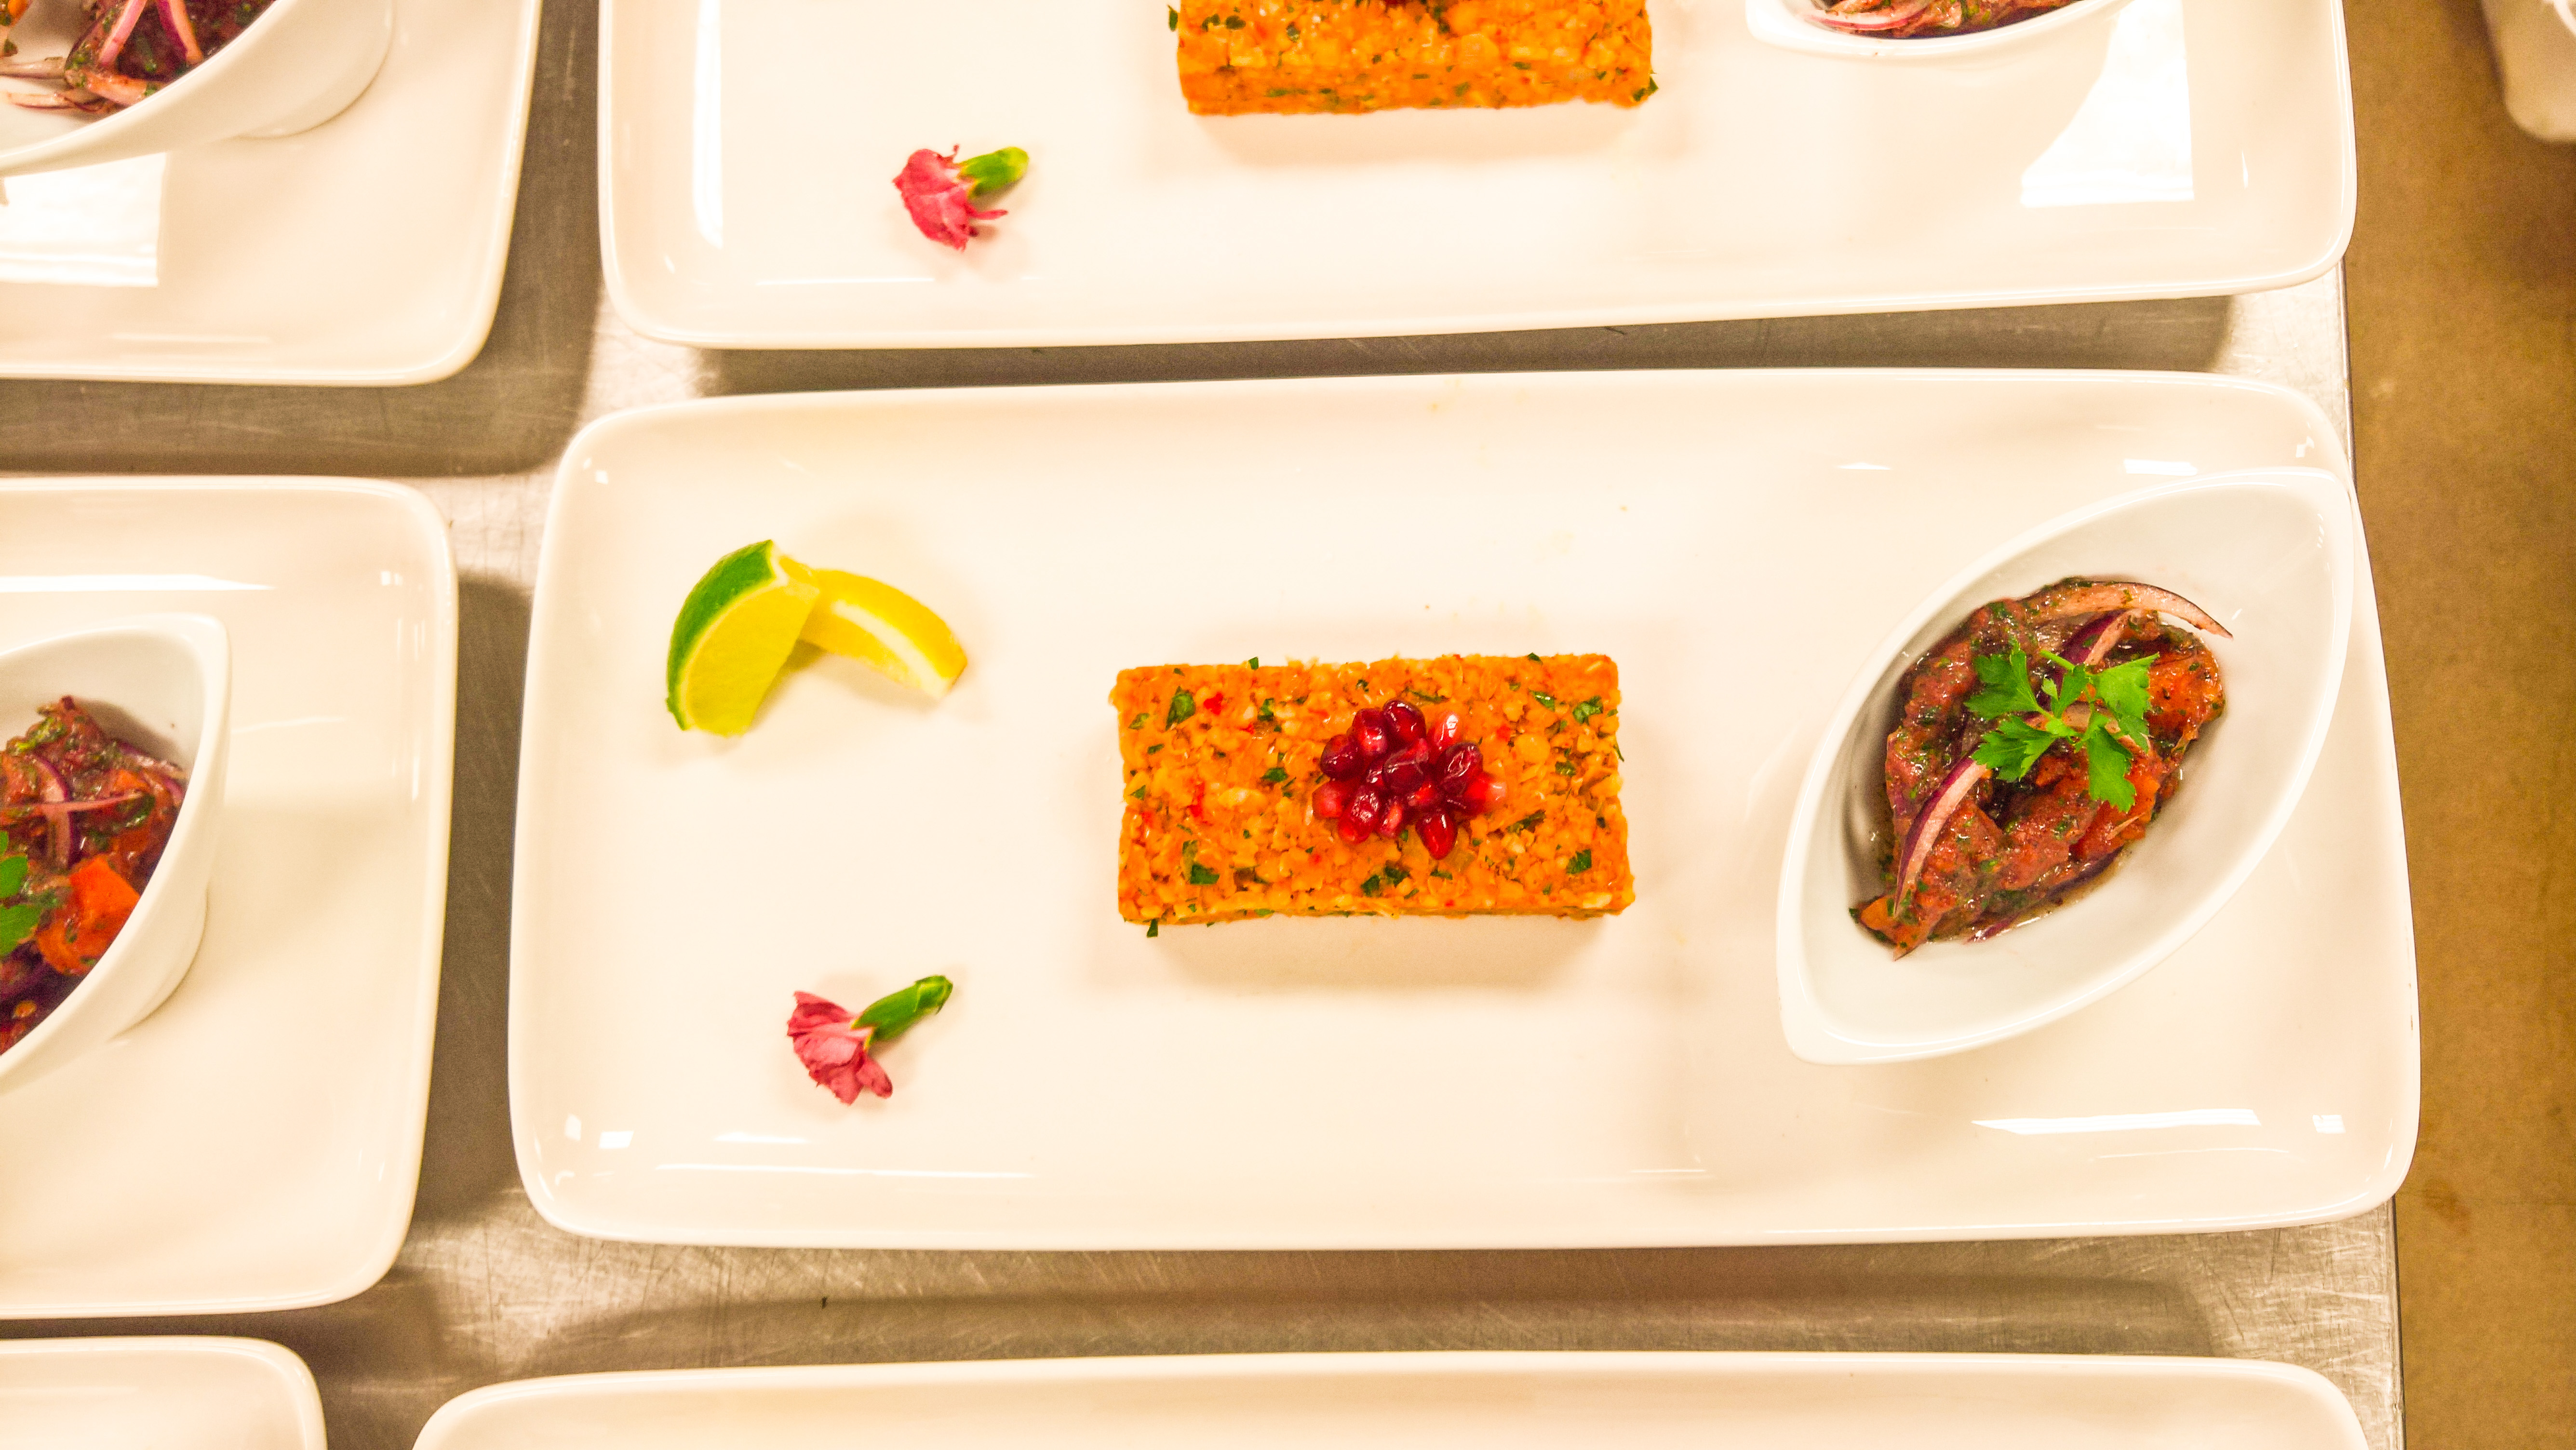 Lentil and Bulgur block, red onion sumac salad